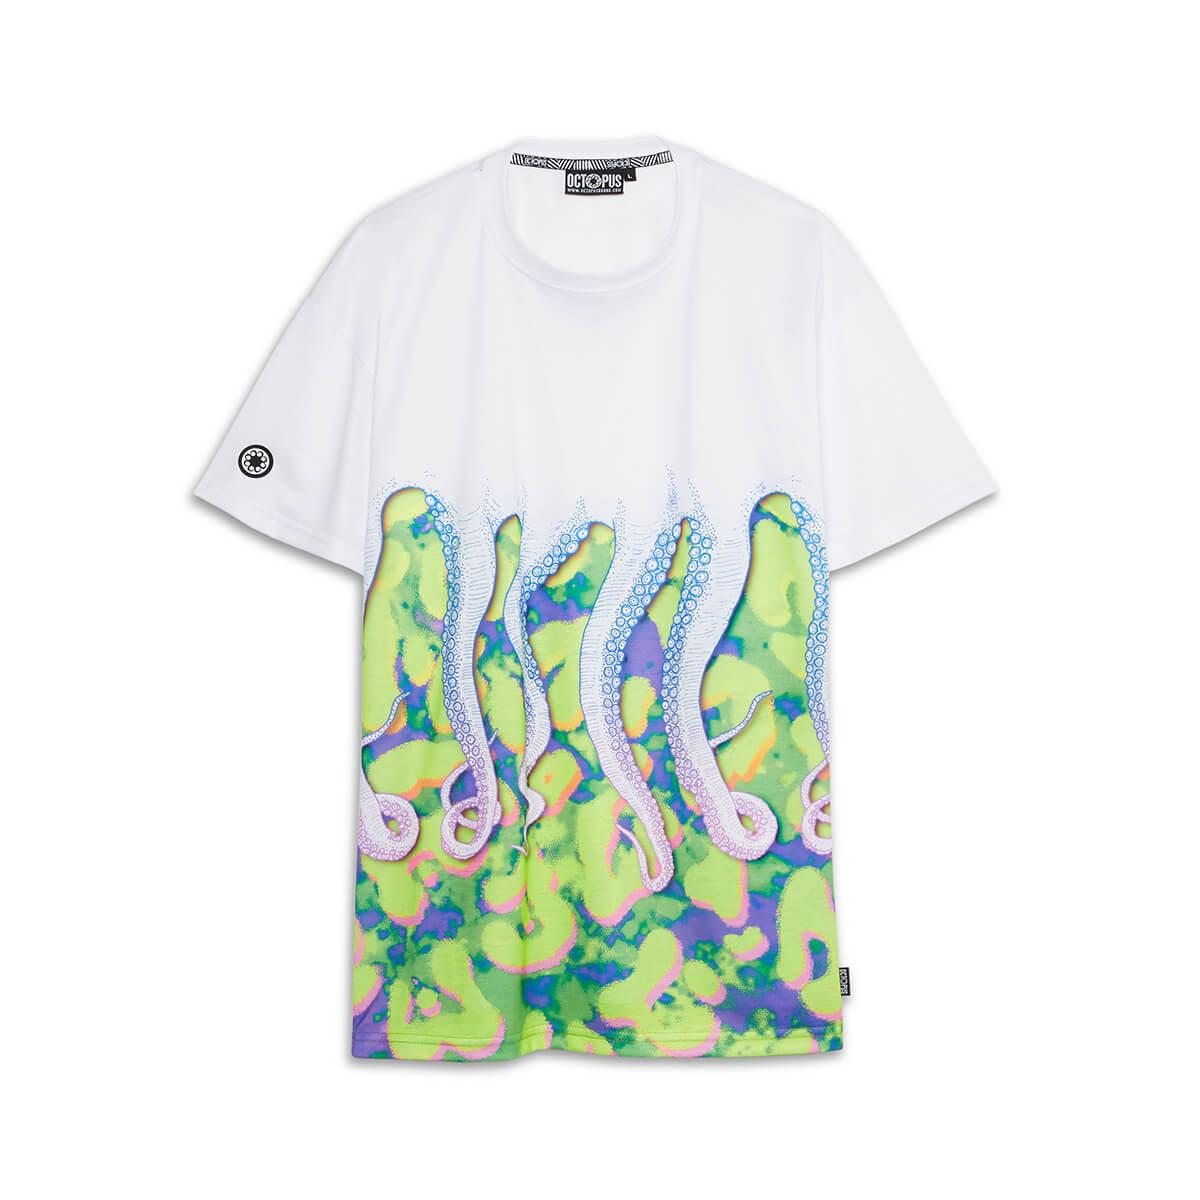 Octopus T-Shirt Drank Tee White_